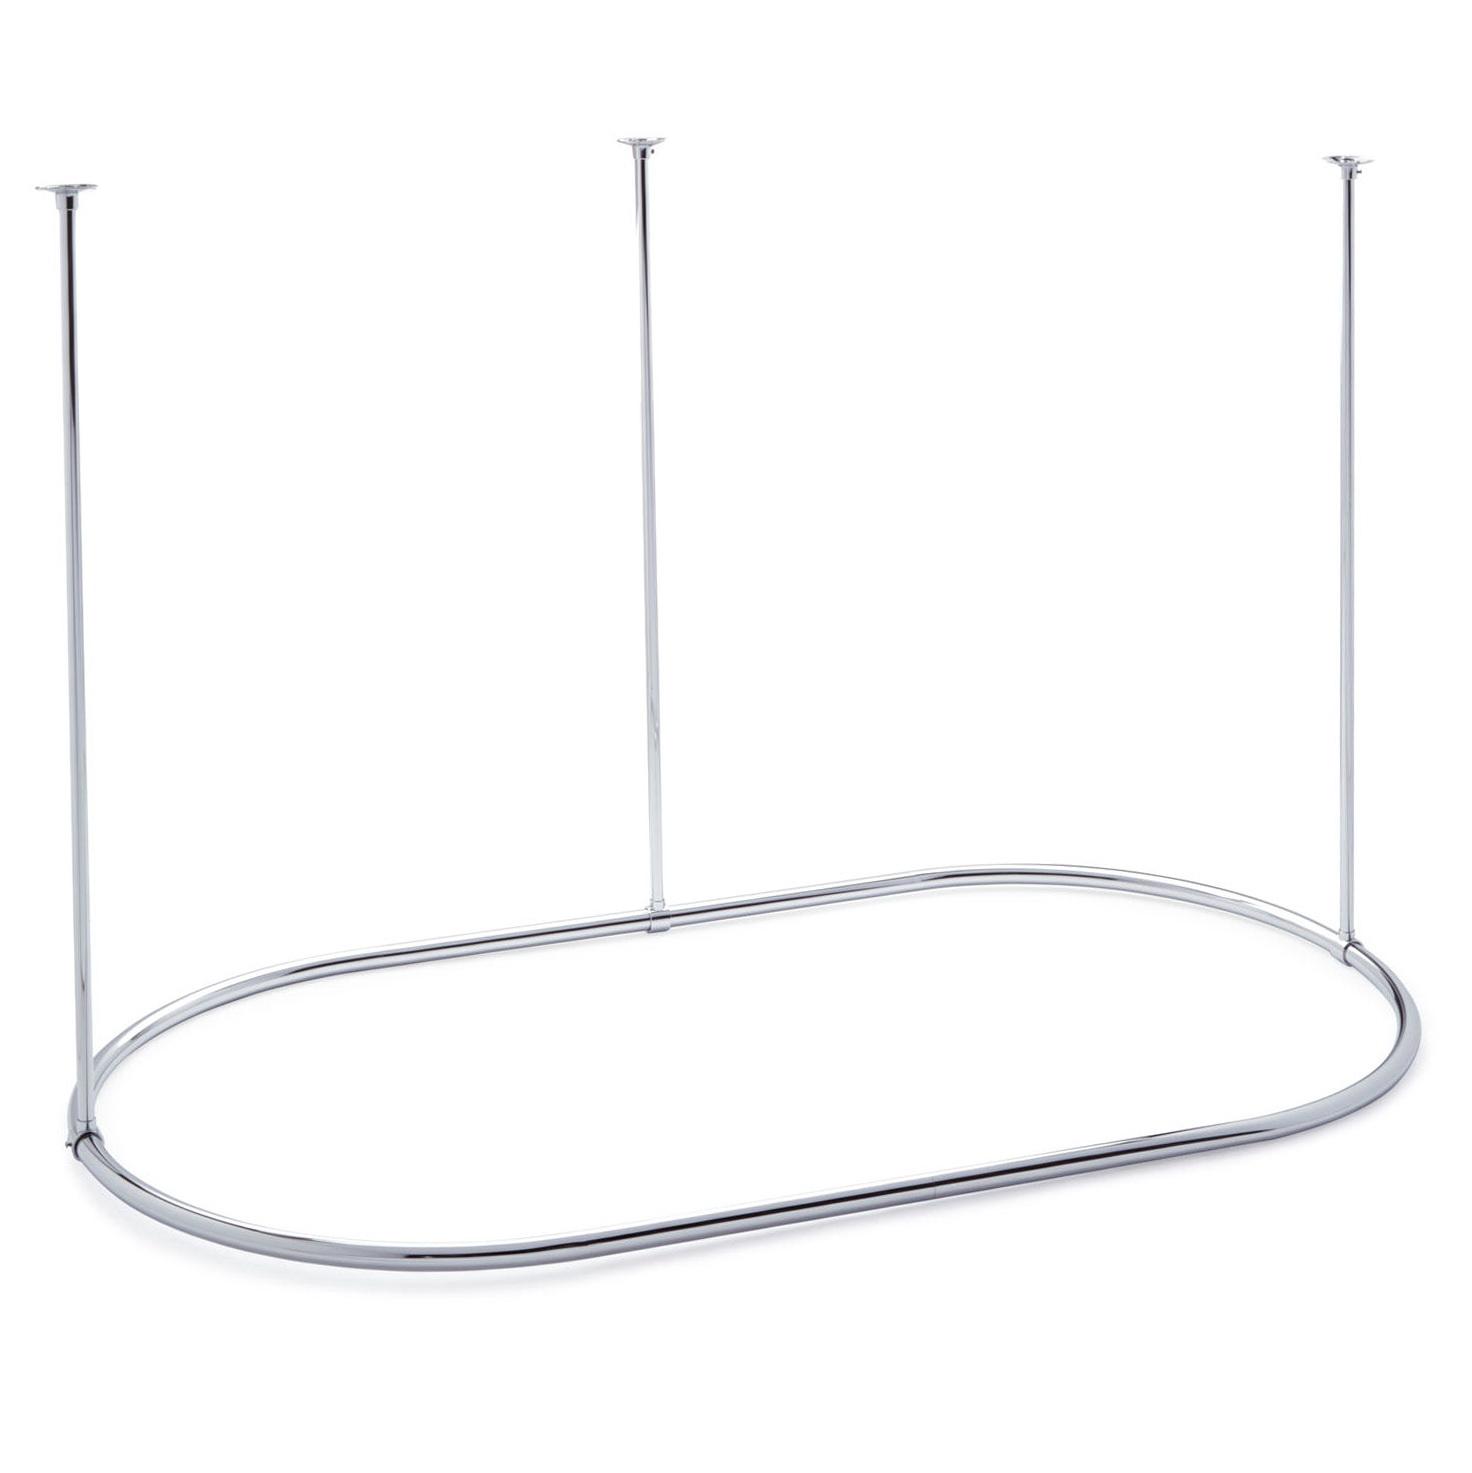 Oval Shower Curtain Rod Australia